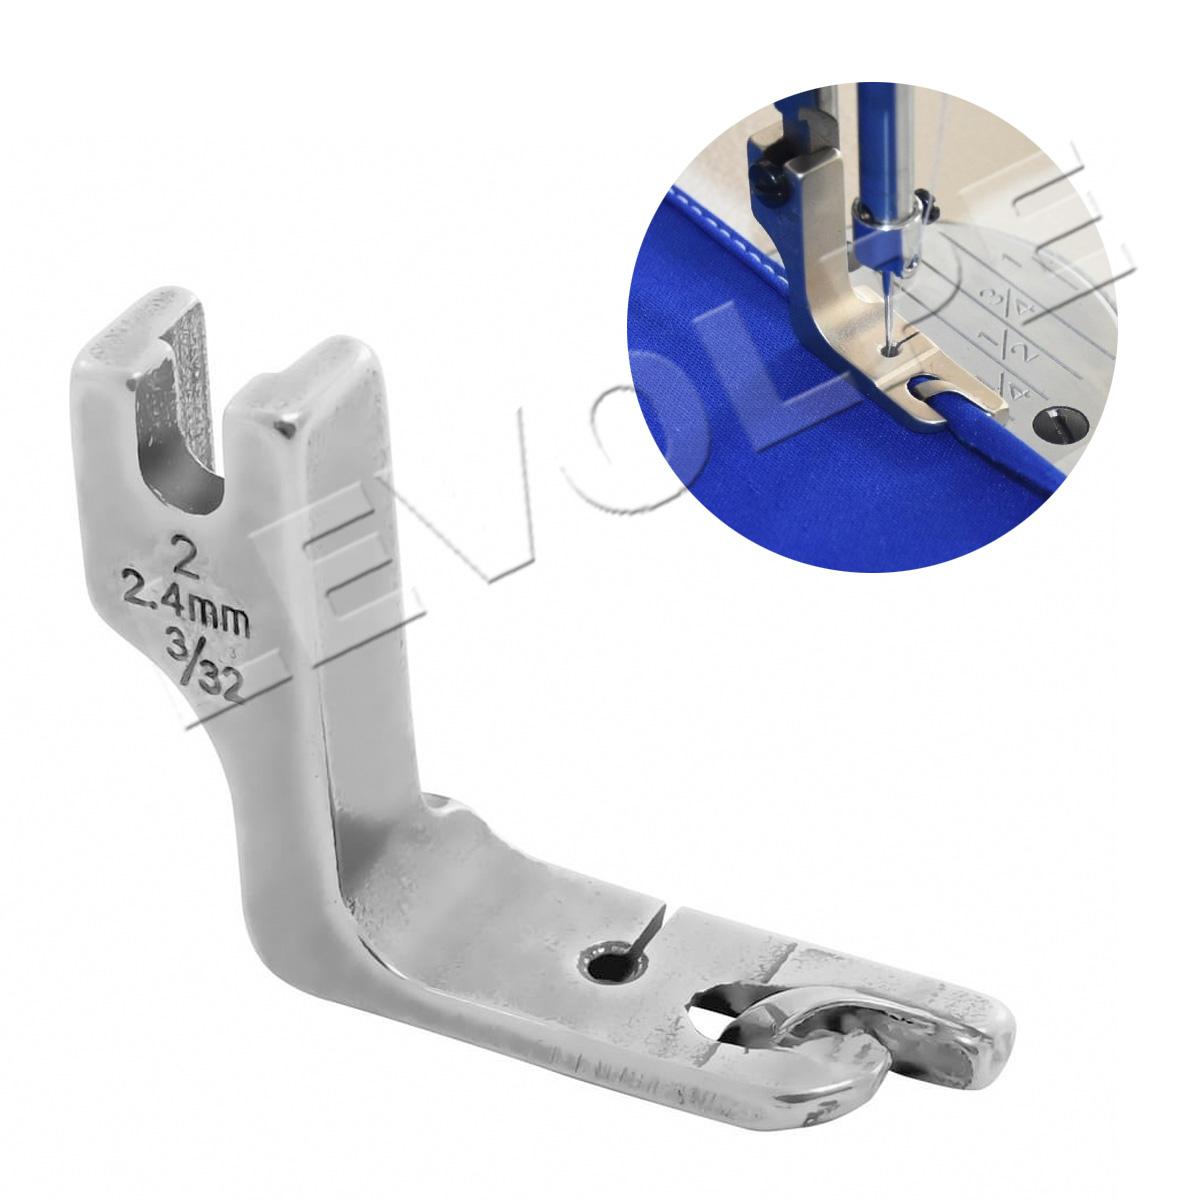 Sapata Calcador Bainha Enrolada 2.4mm Reta Industrial